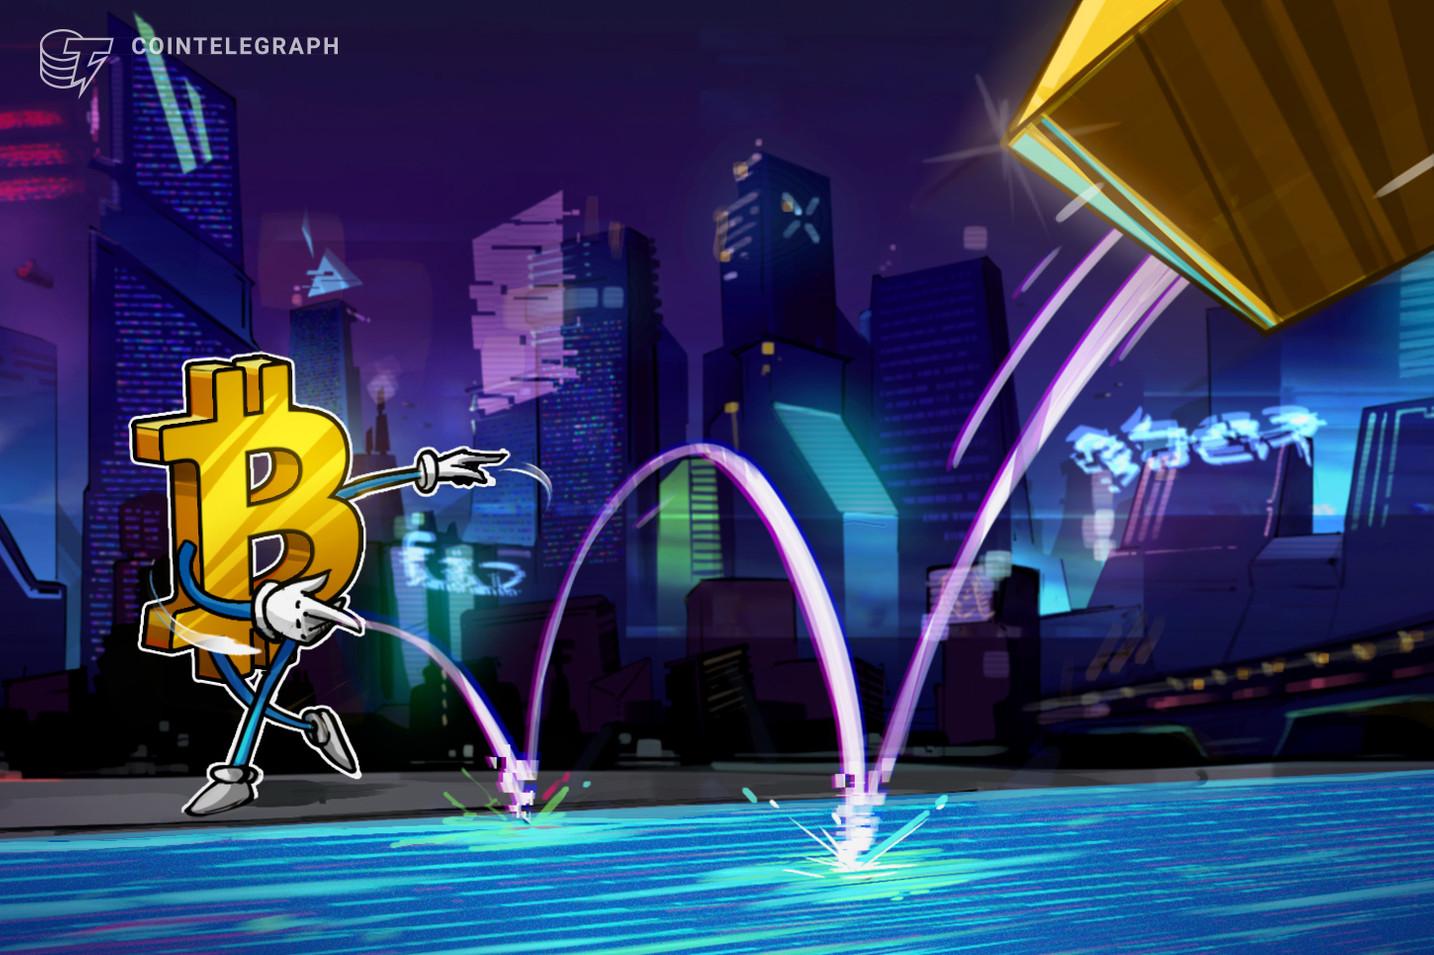 JPMorgan acredita que o Bitcoin vai capturar a participação do mercado do ouro